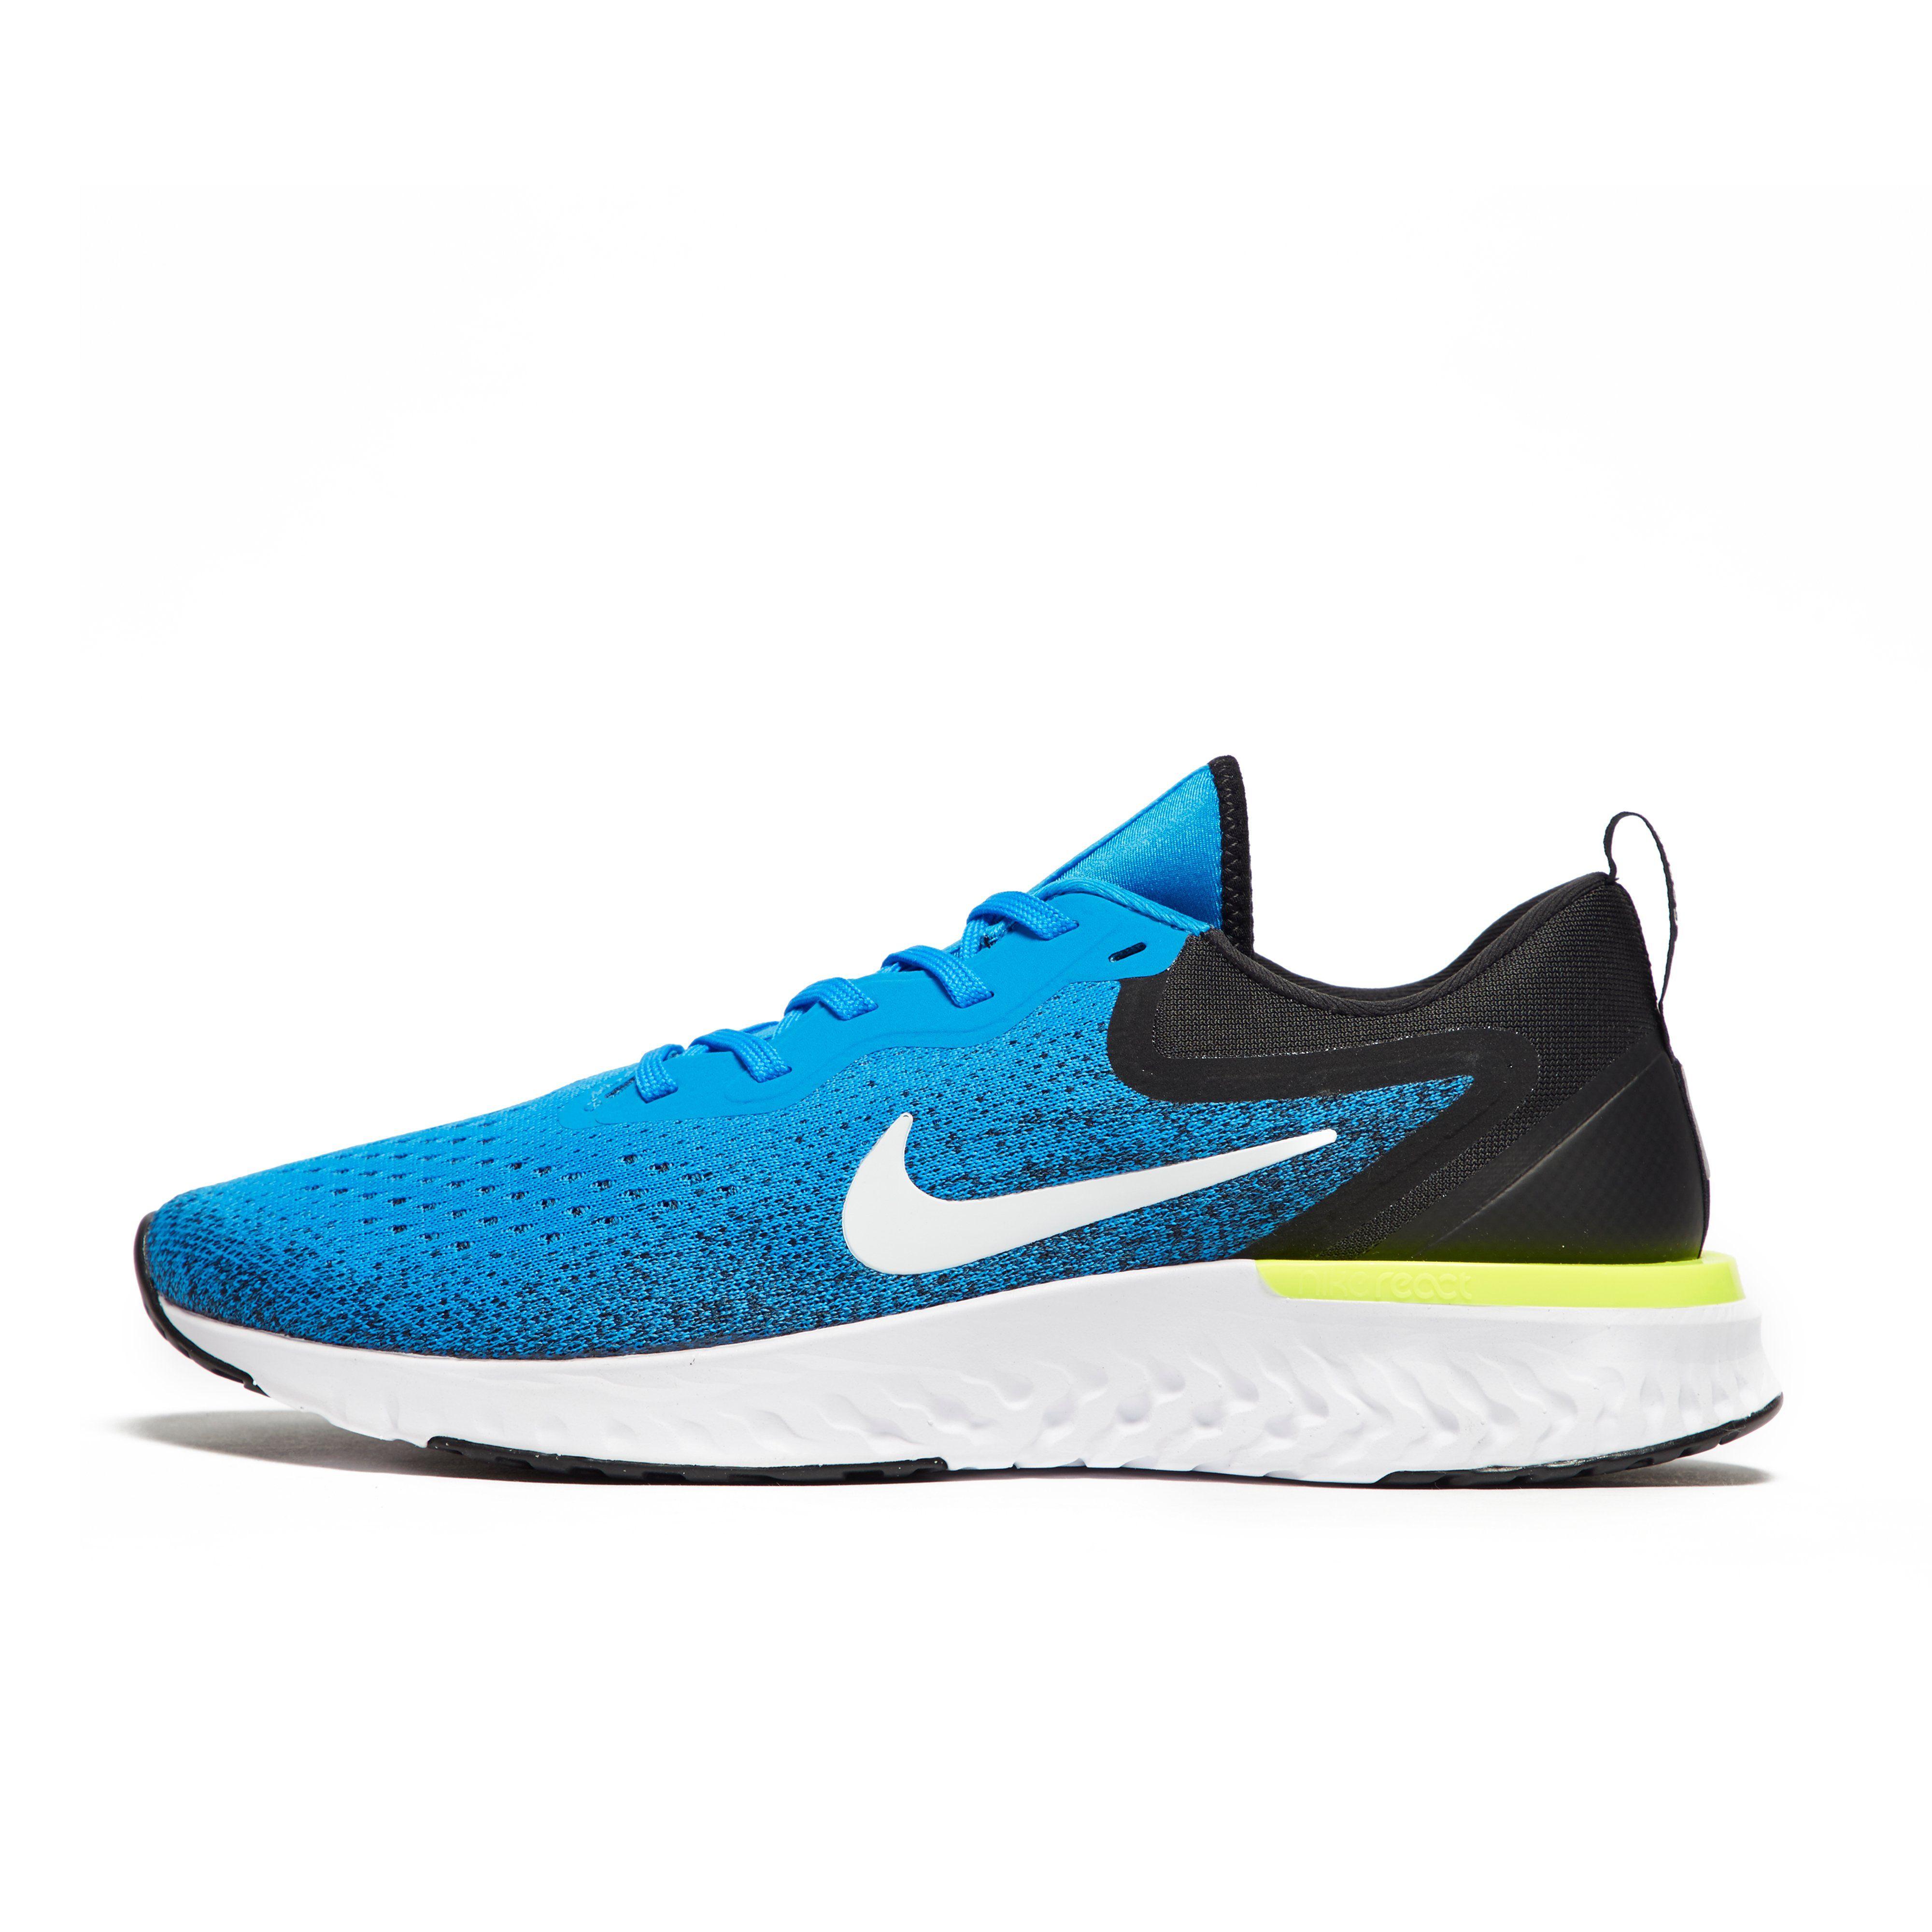 Nike Odyssey React Men's Running Shoes